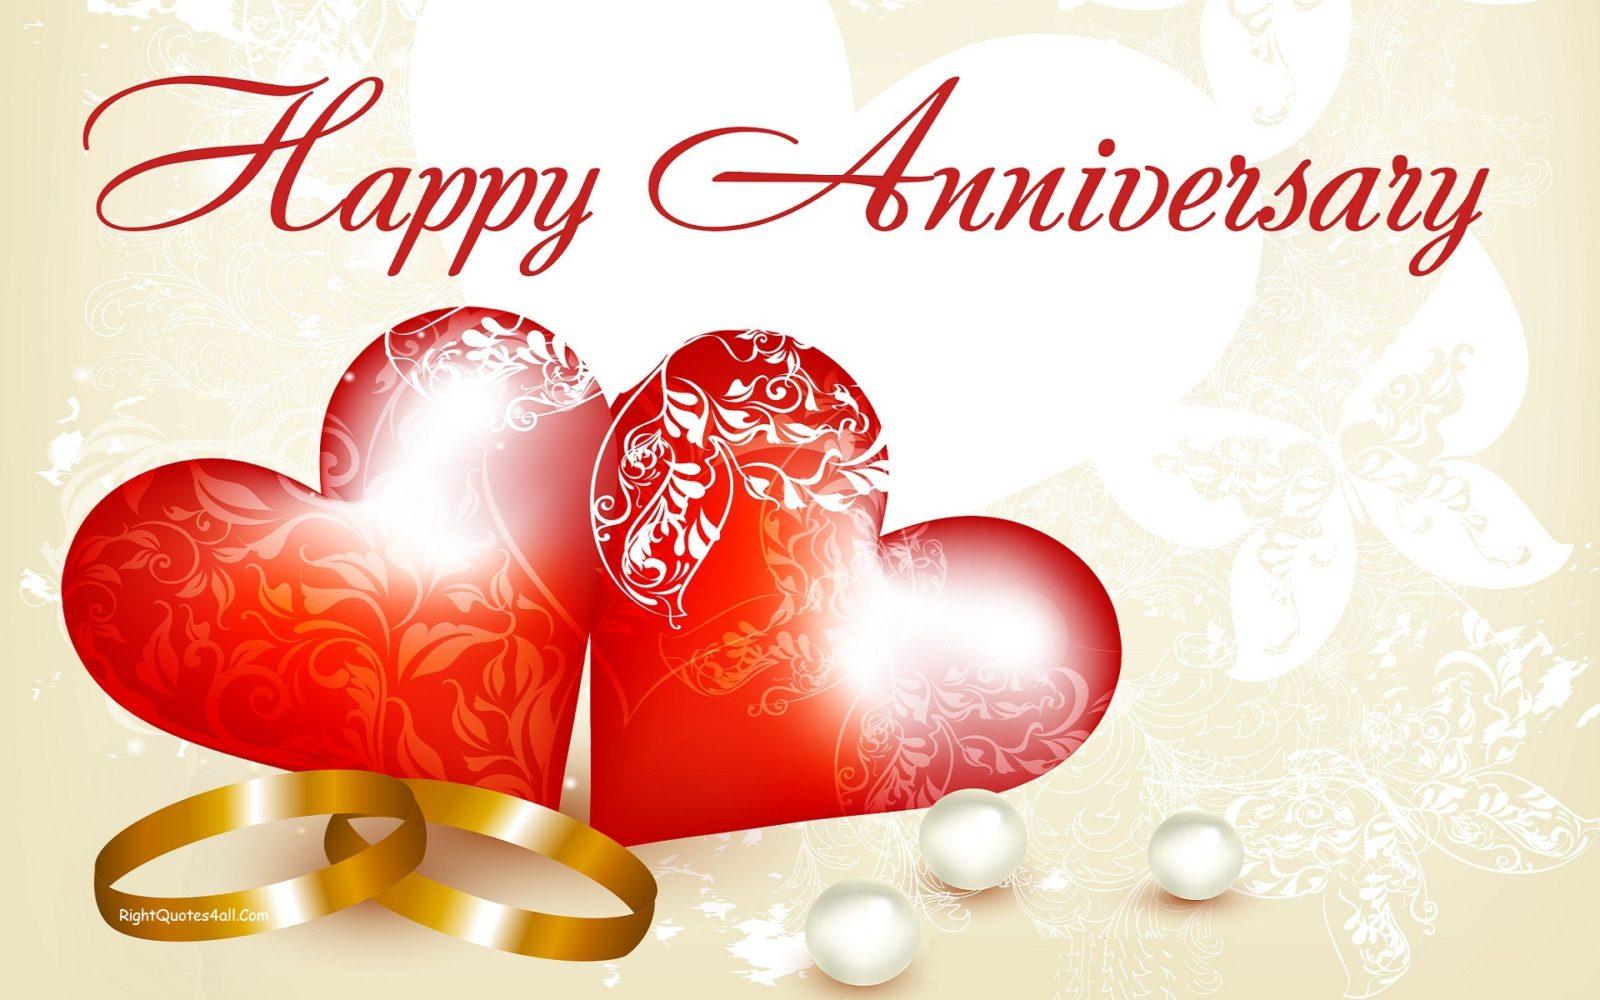 Happy Wedding Anniversary Quotes.Marriage Anniversary Wishes Quotes For Hubby Anniversary